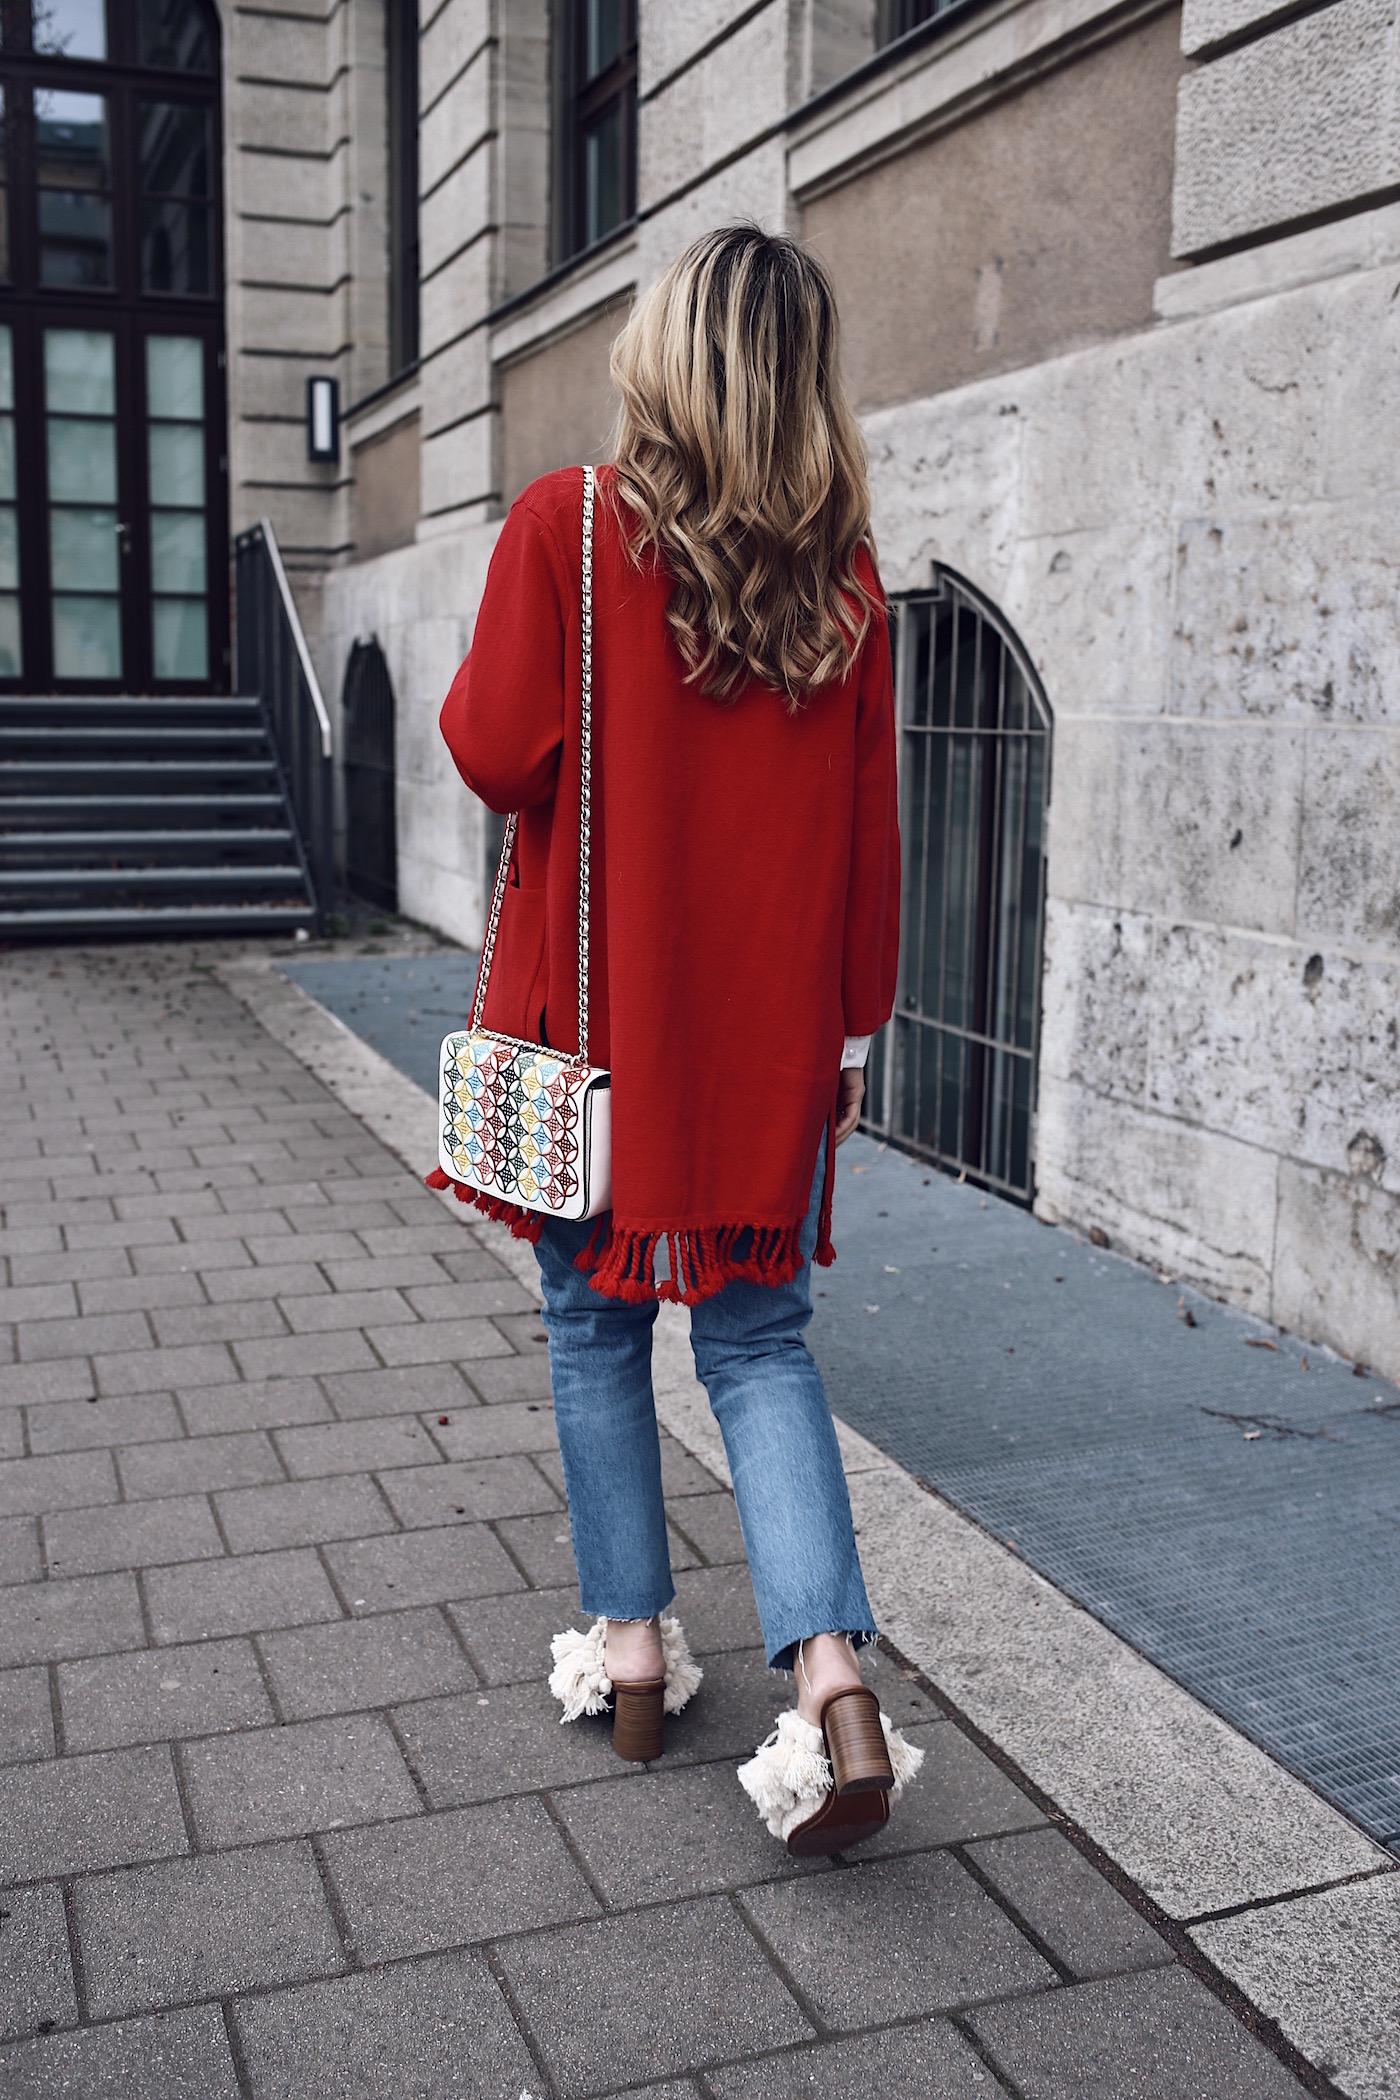 Pom Pom Sandals Tory Burch Bag Red Cardigan Street Style Fashion Blog Erlangen